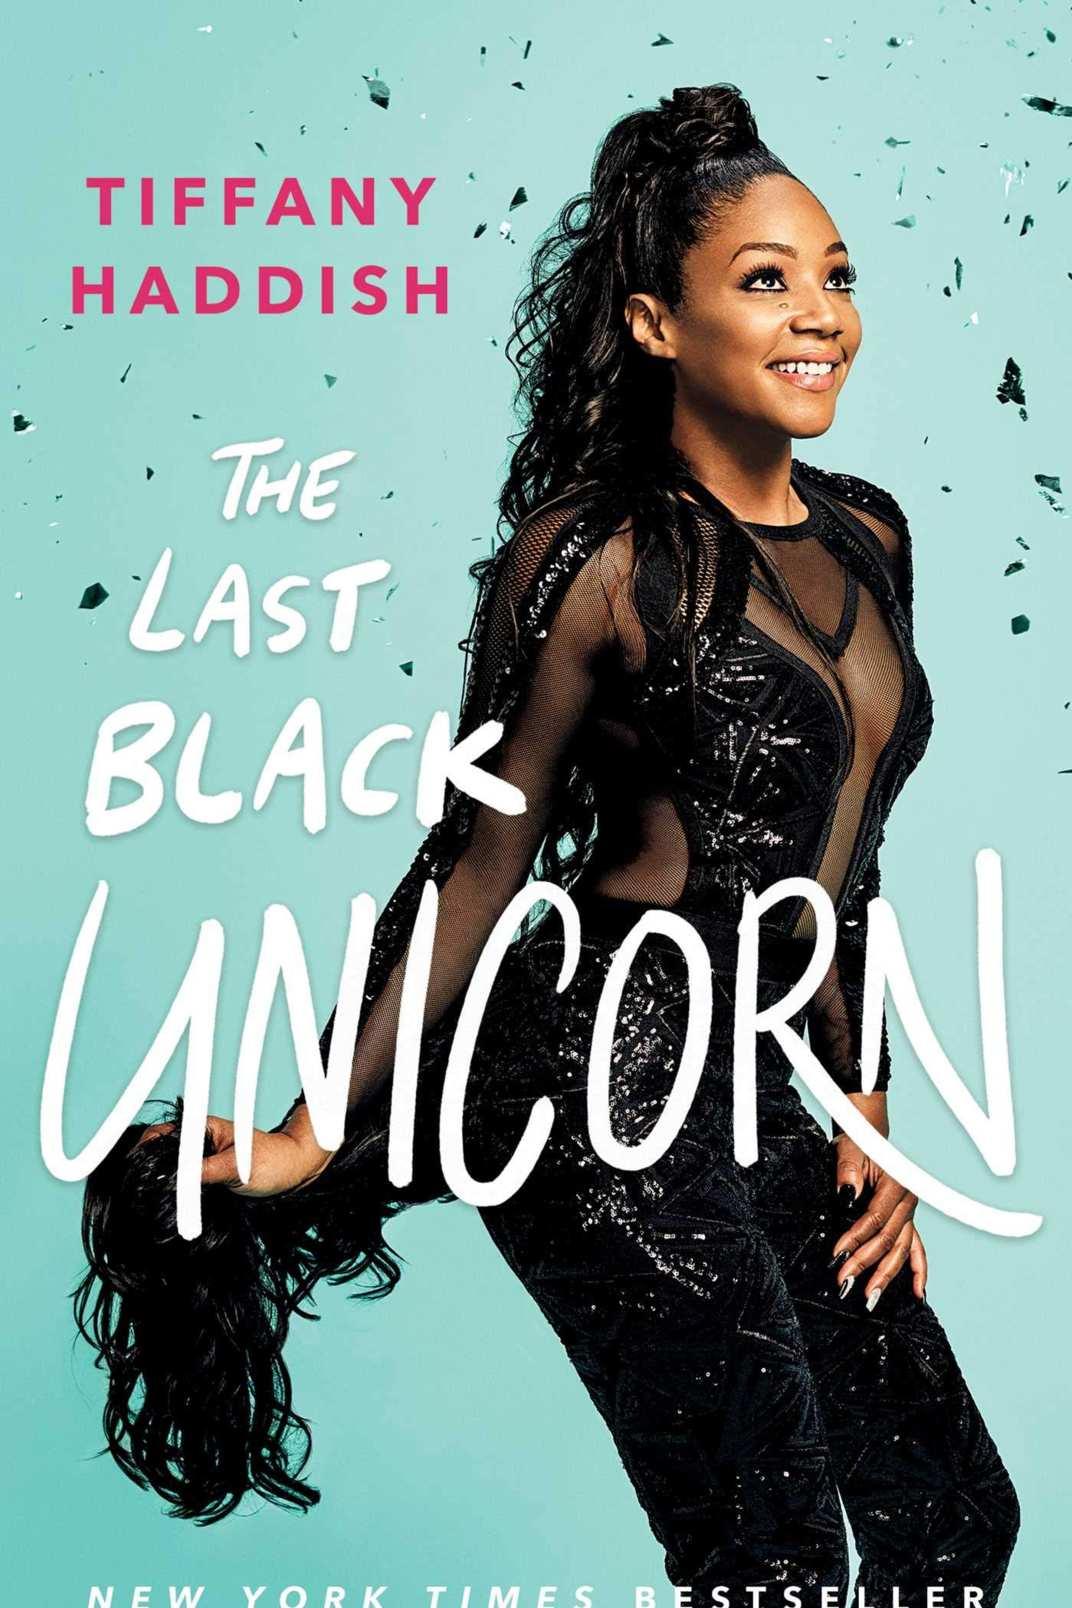 <em>The Last Black Unicorn</em> by Tiffany Haddish